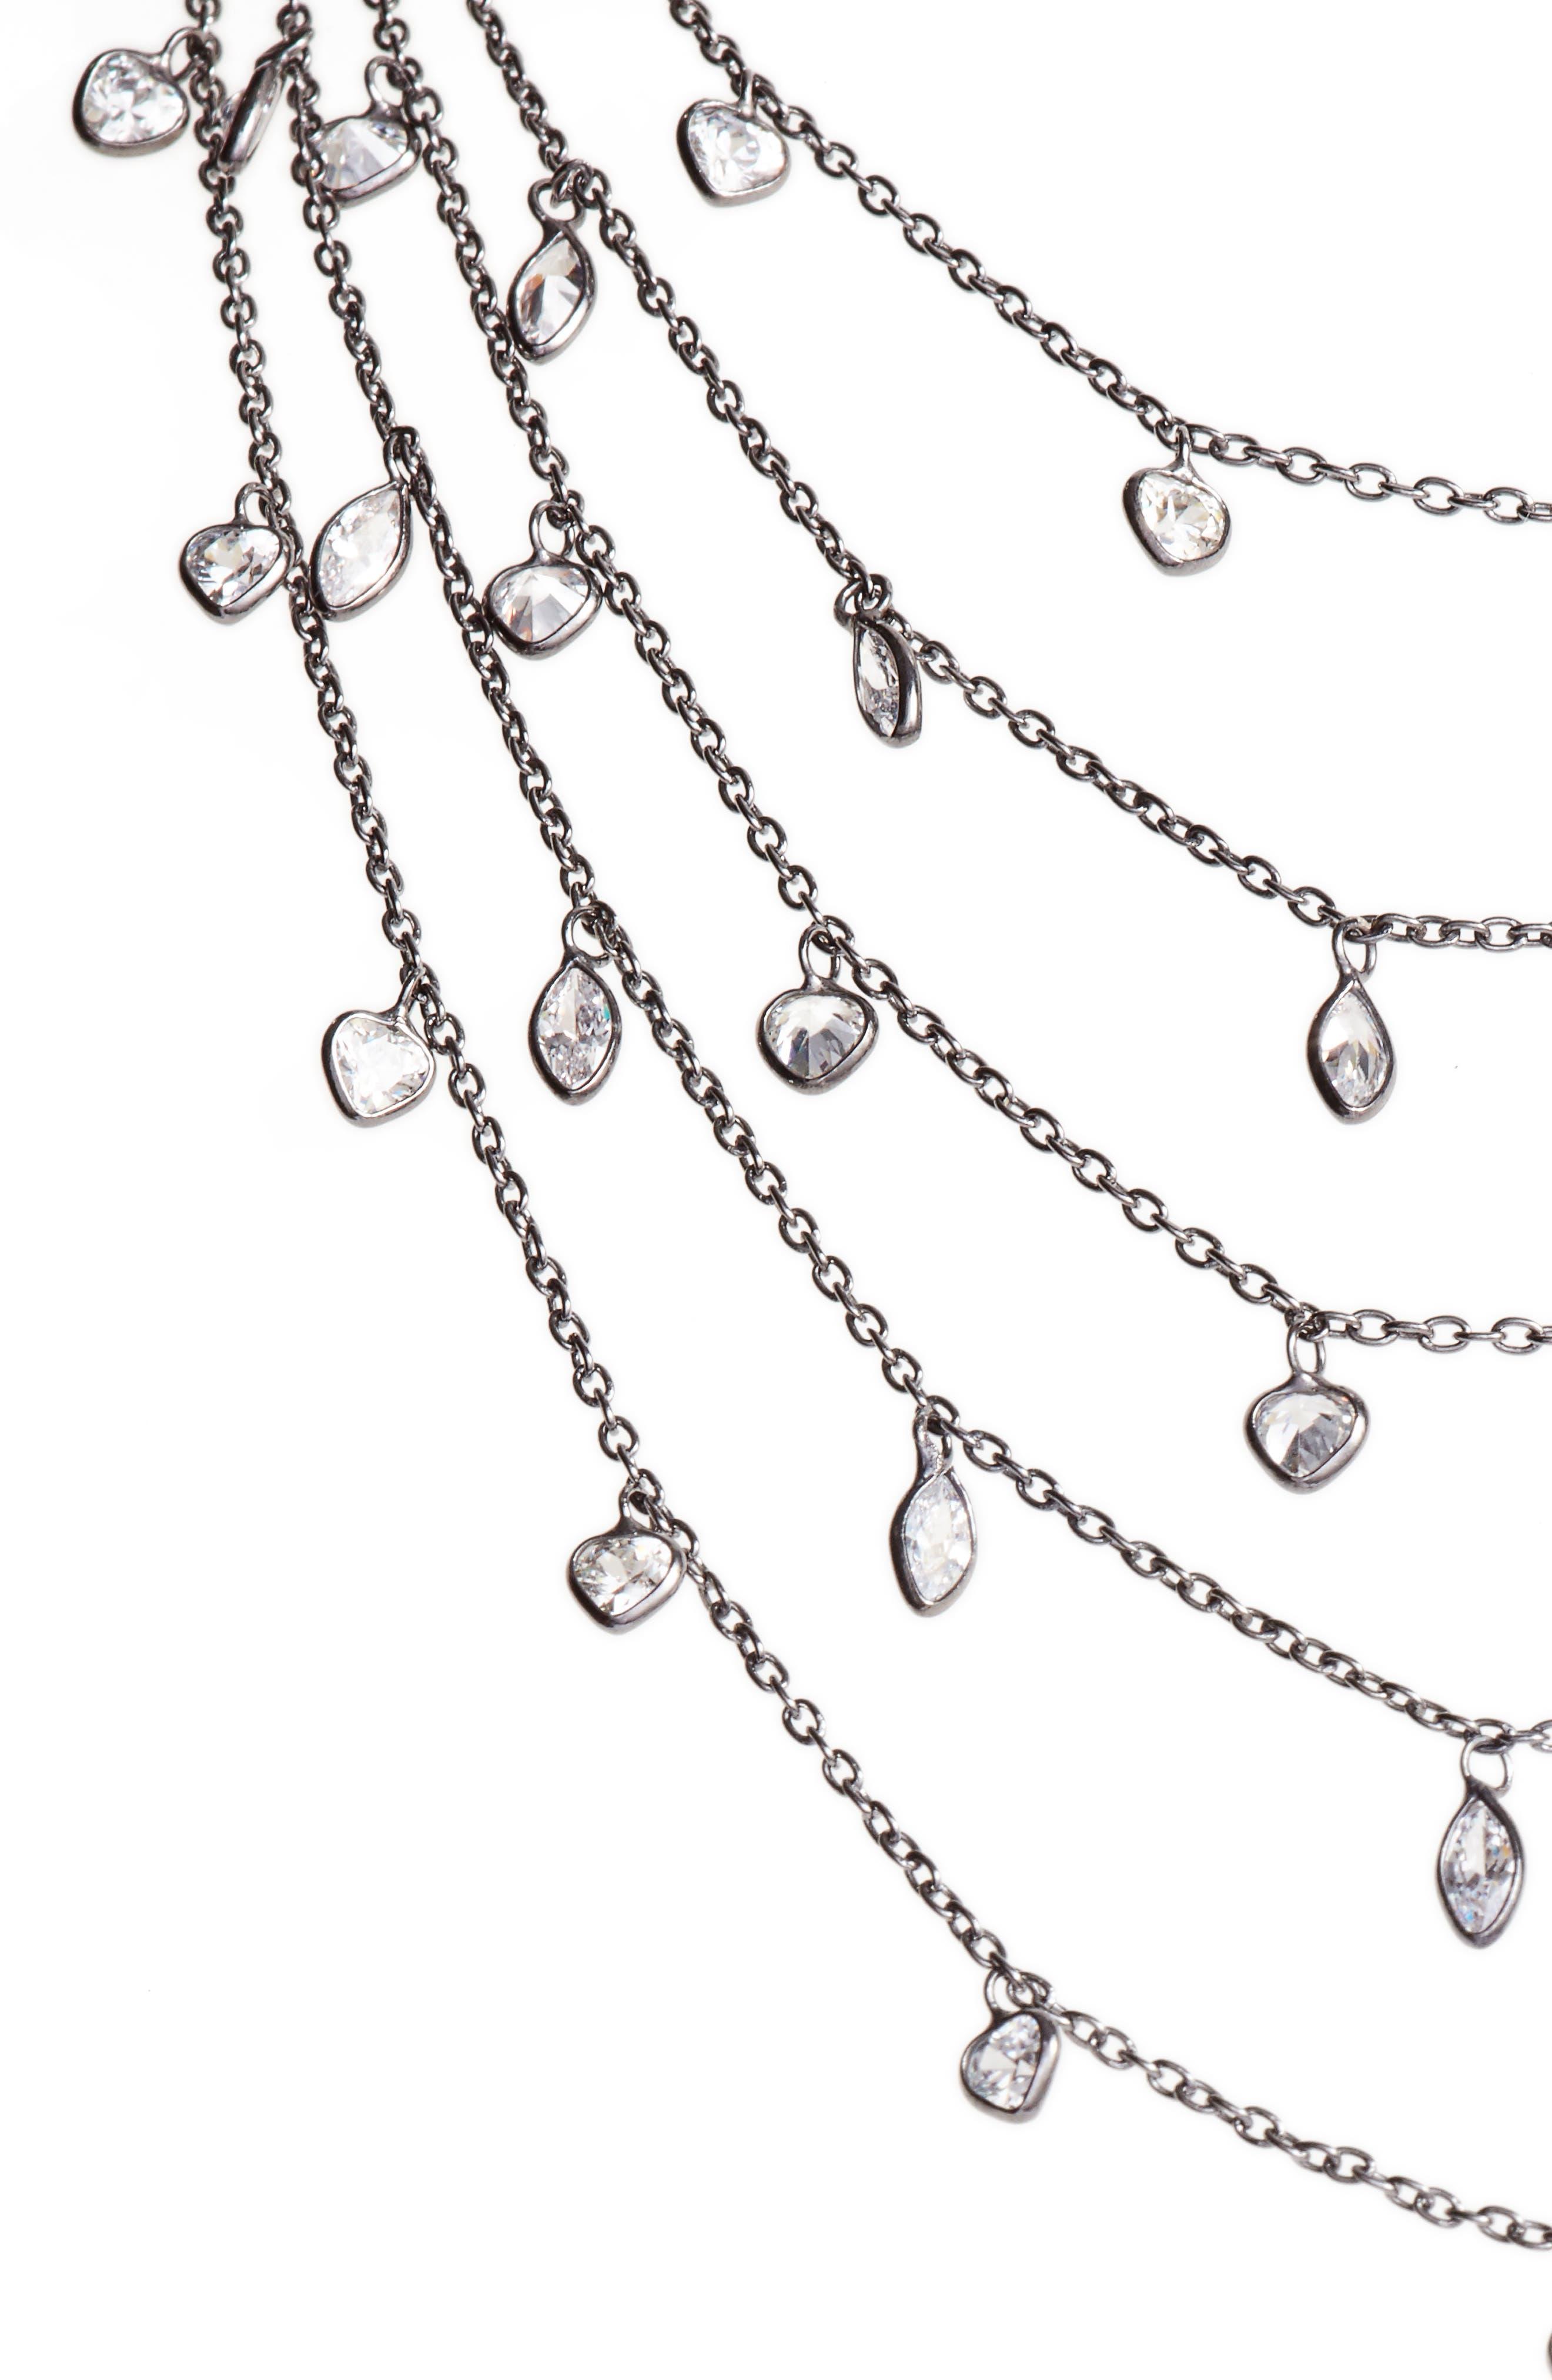 Multistrand Cubic Zirconia Necklace,                         Main,                         color, BLACK